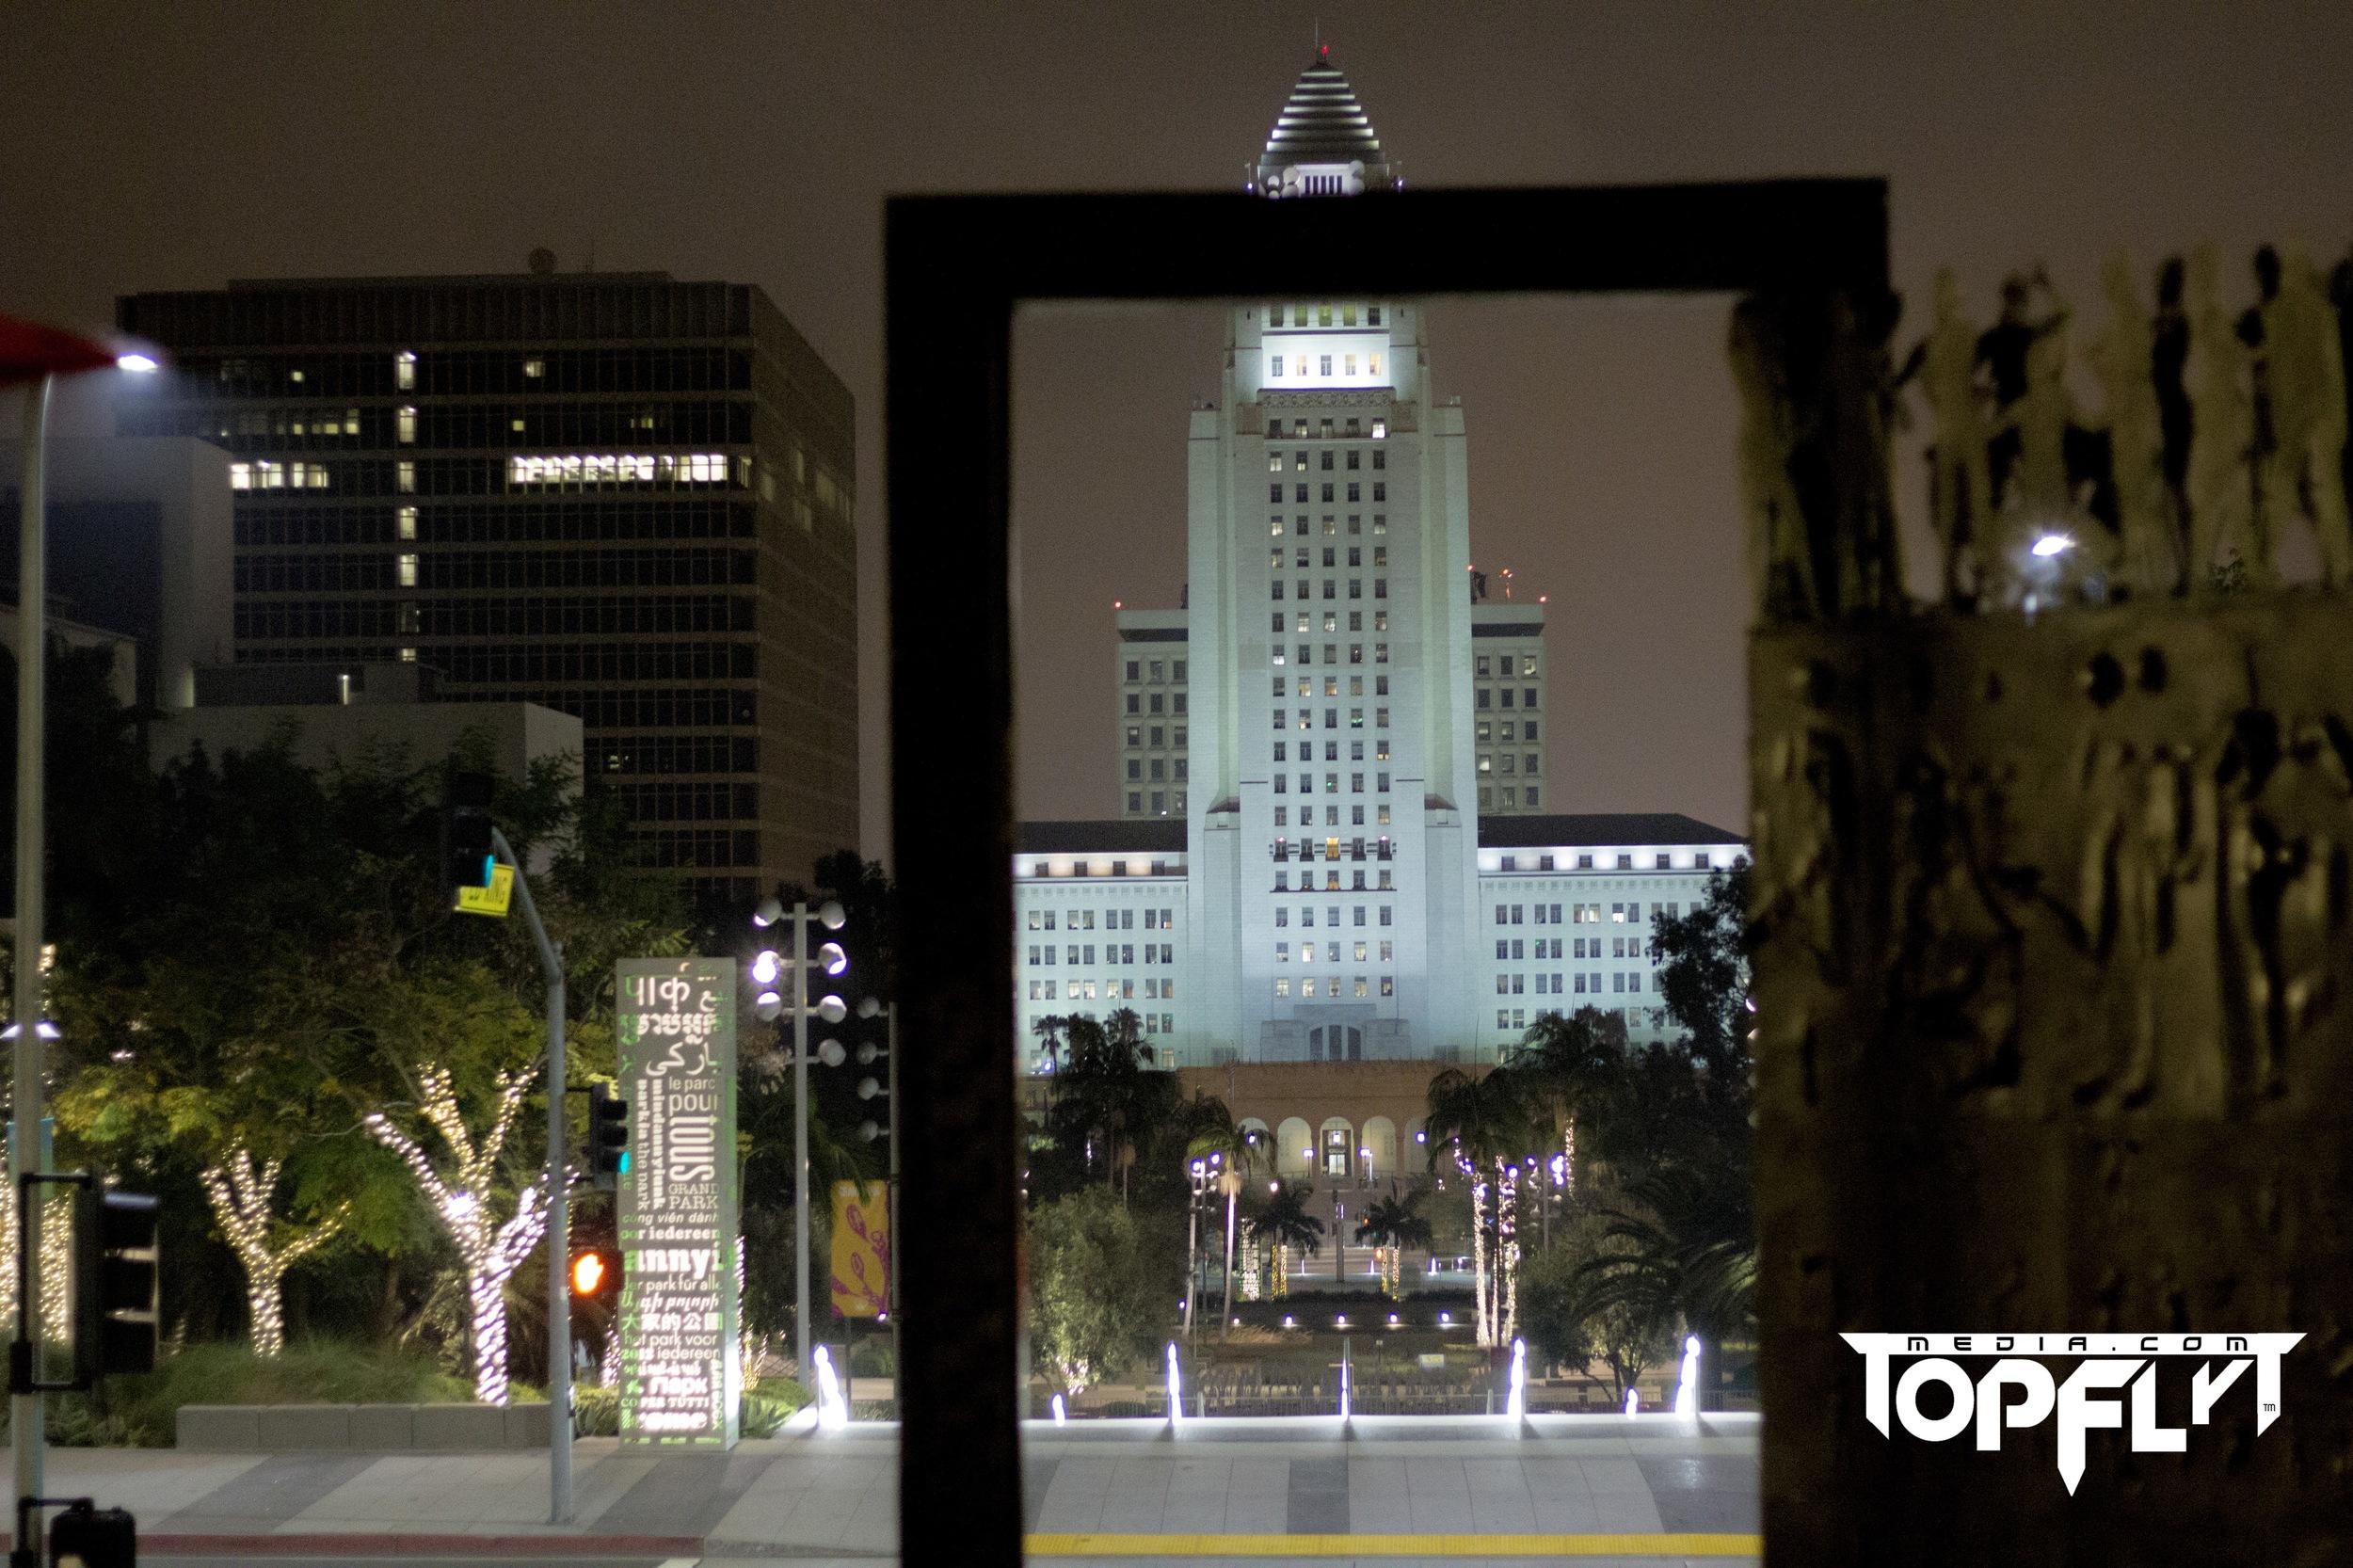 Downtown+LA_10.jpg